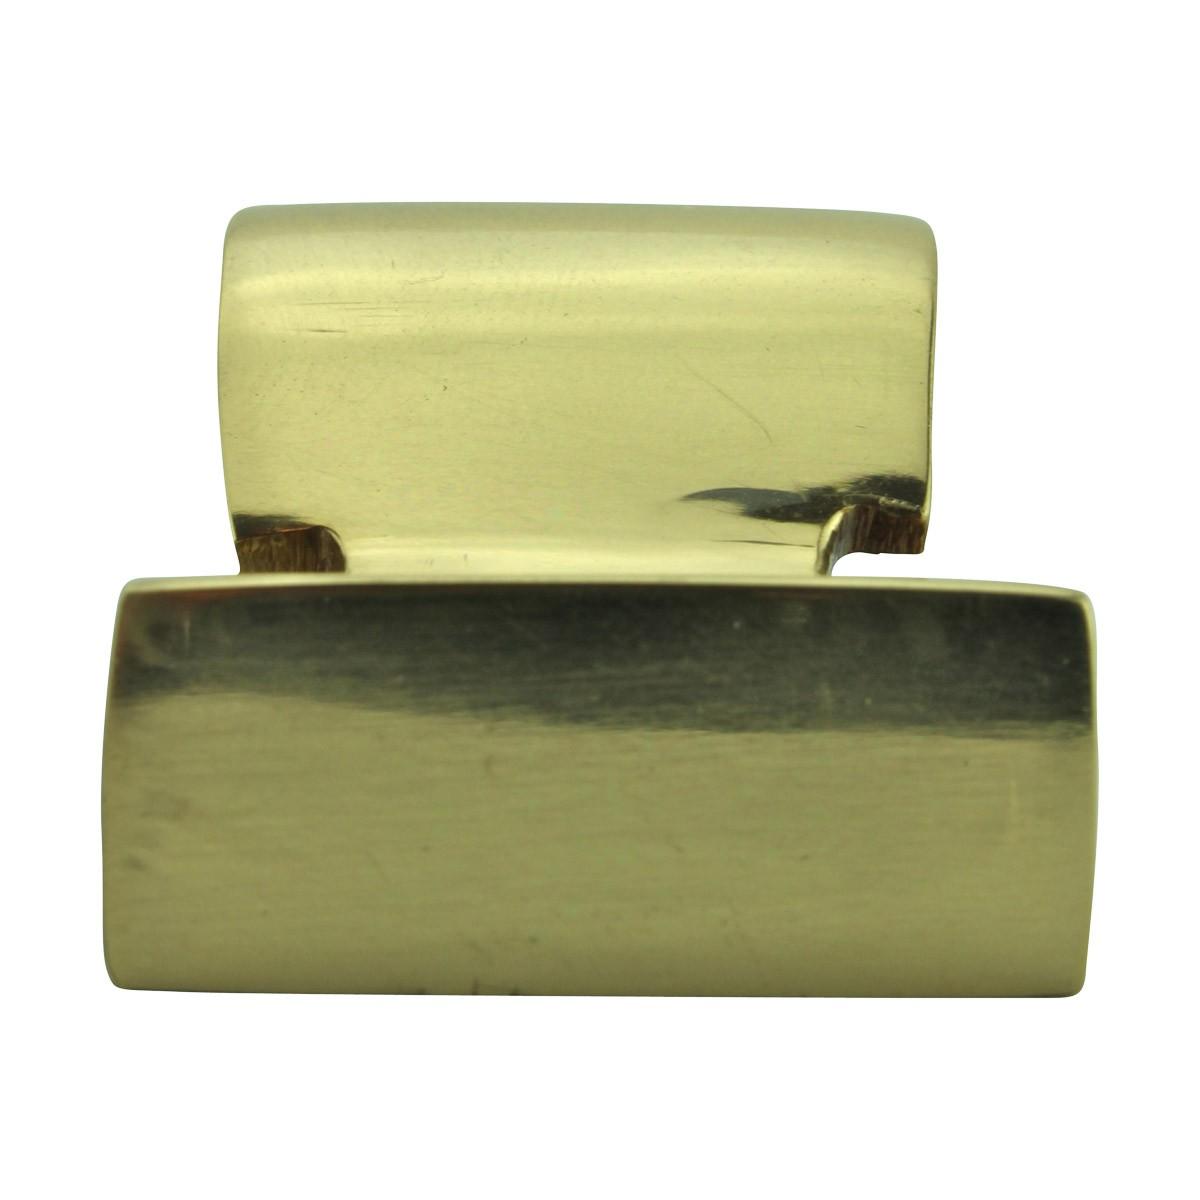 Sash Lift Solid Brass Hinged Cast Brass Sash Lock Decorative Hinged Sash Lift Victorian Sash Window Locks